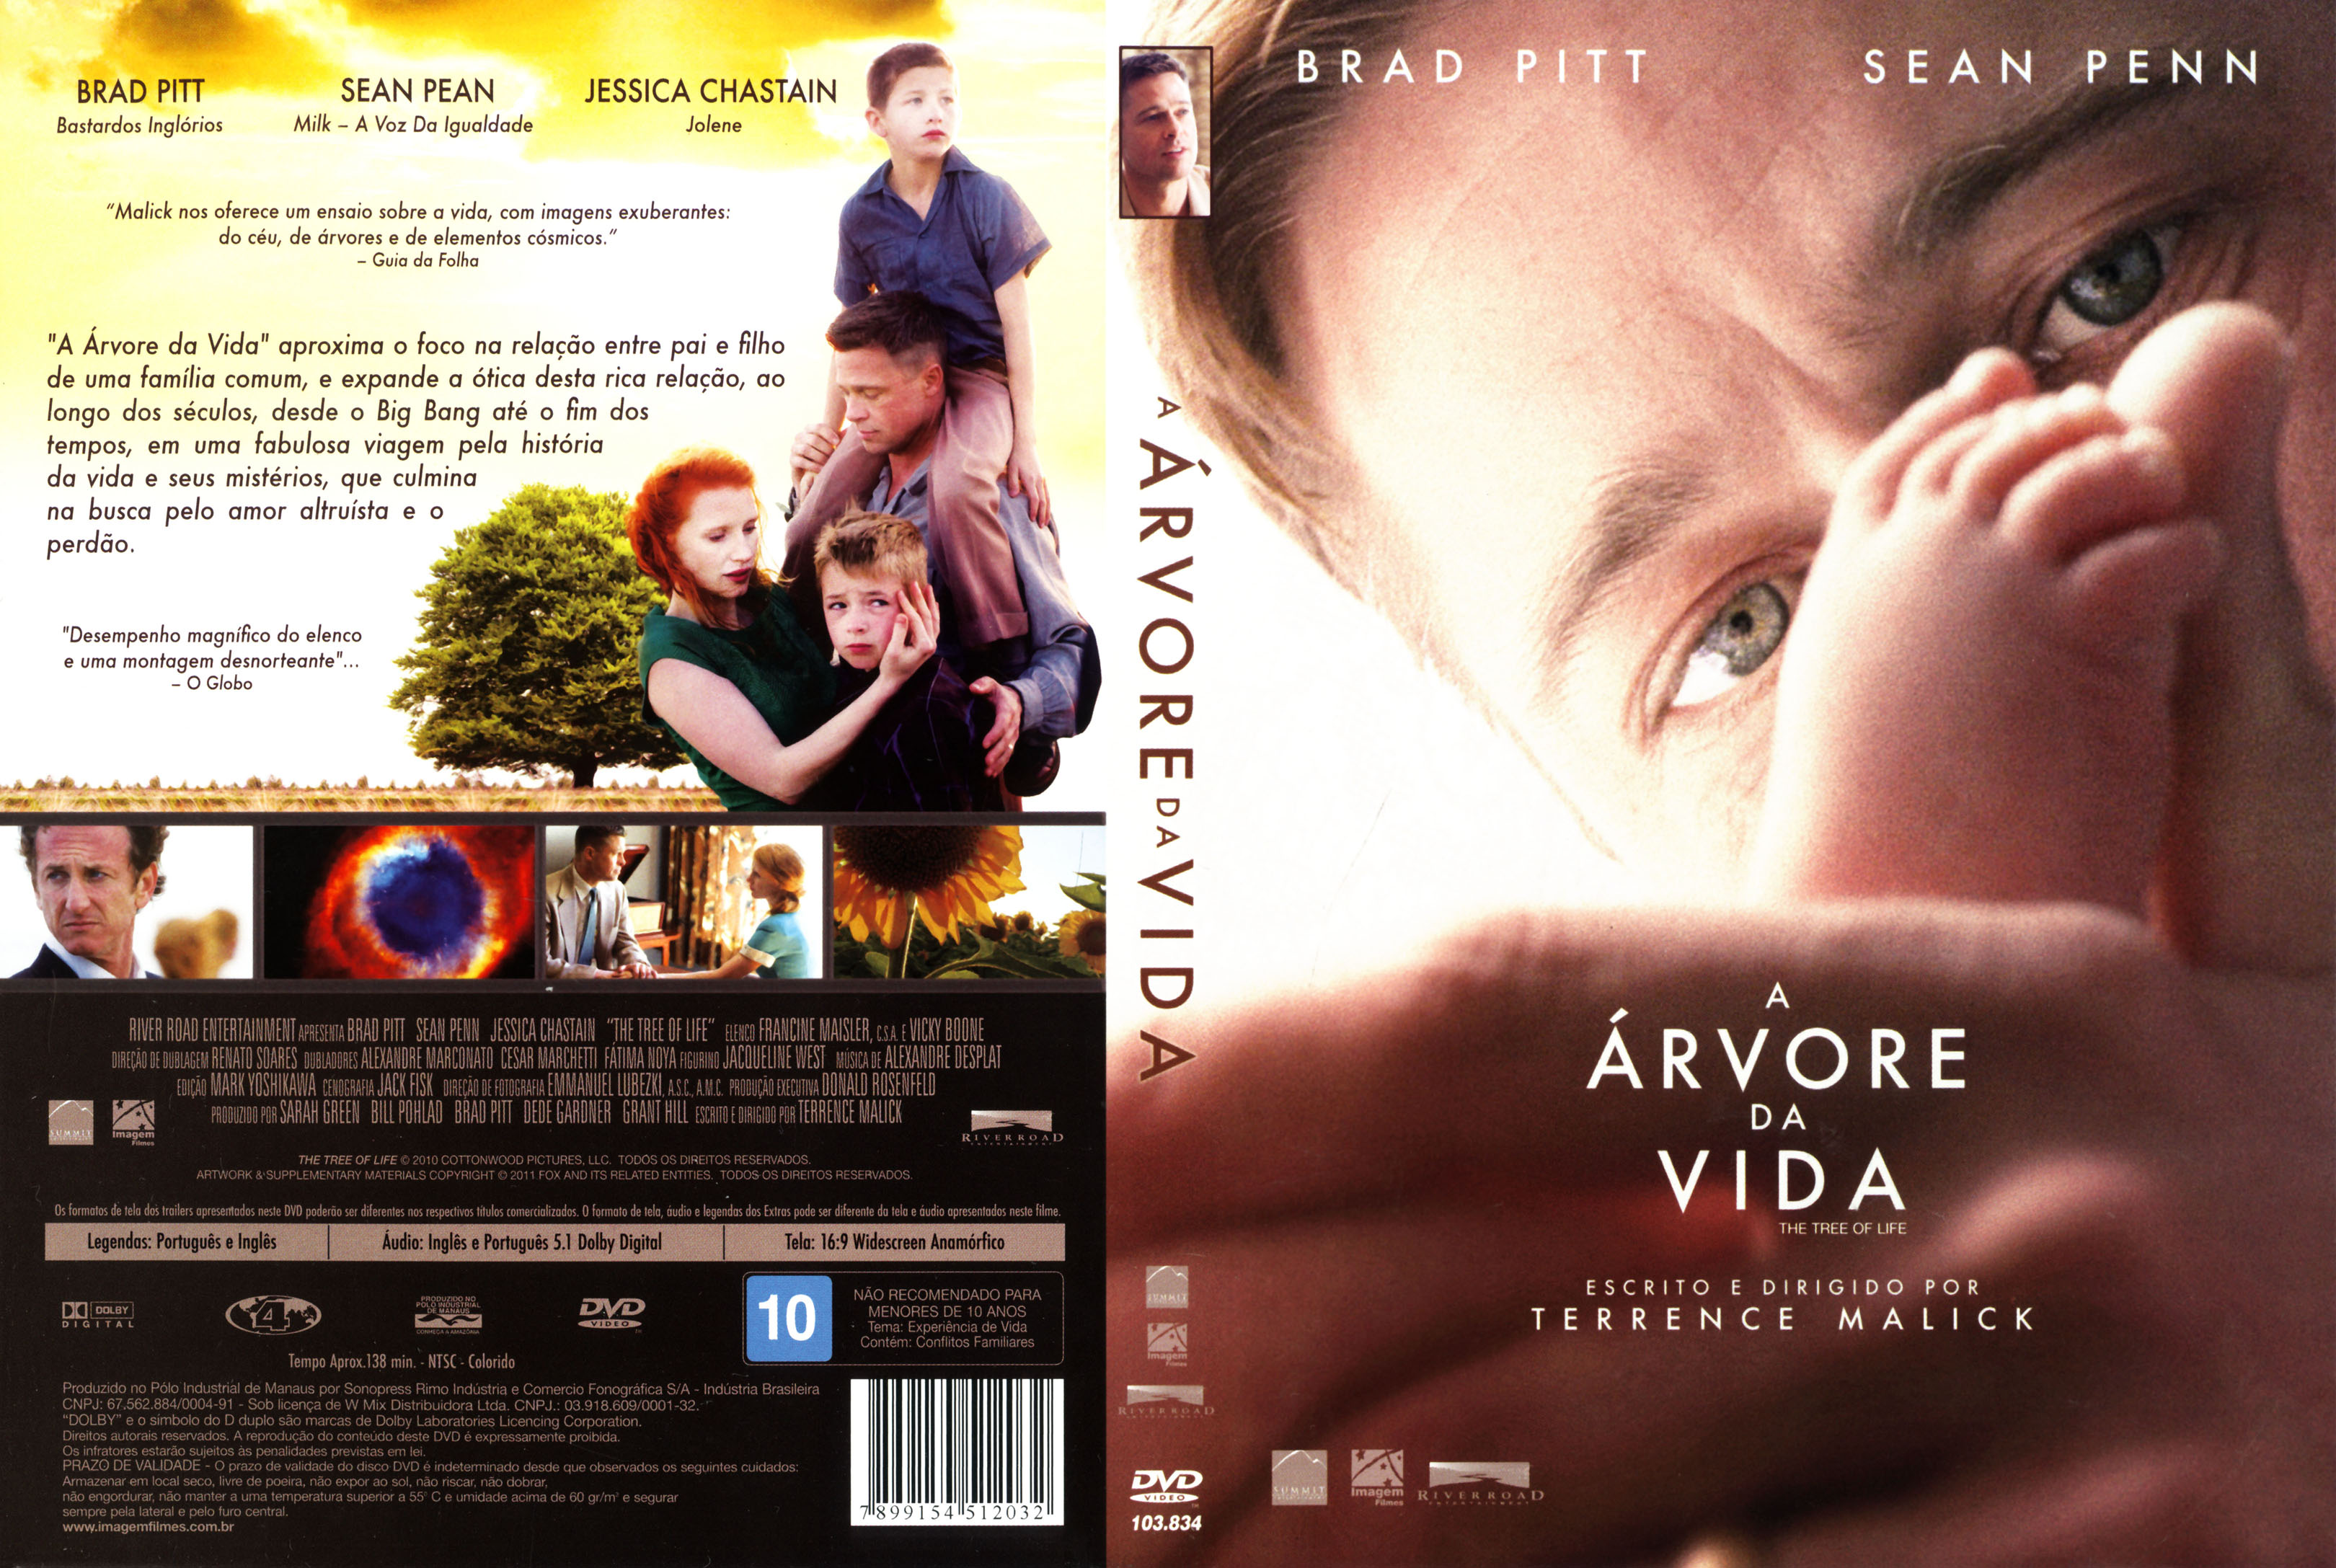 AArvoreDaVida